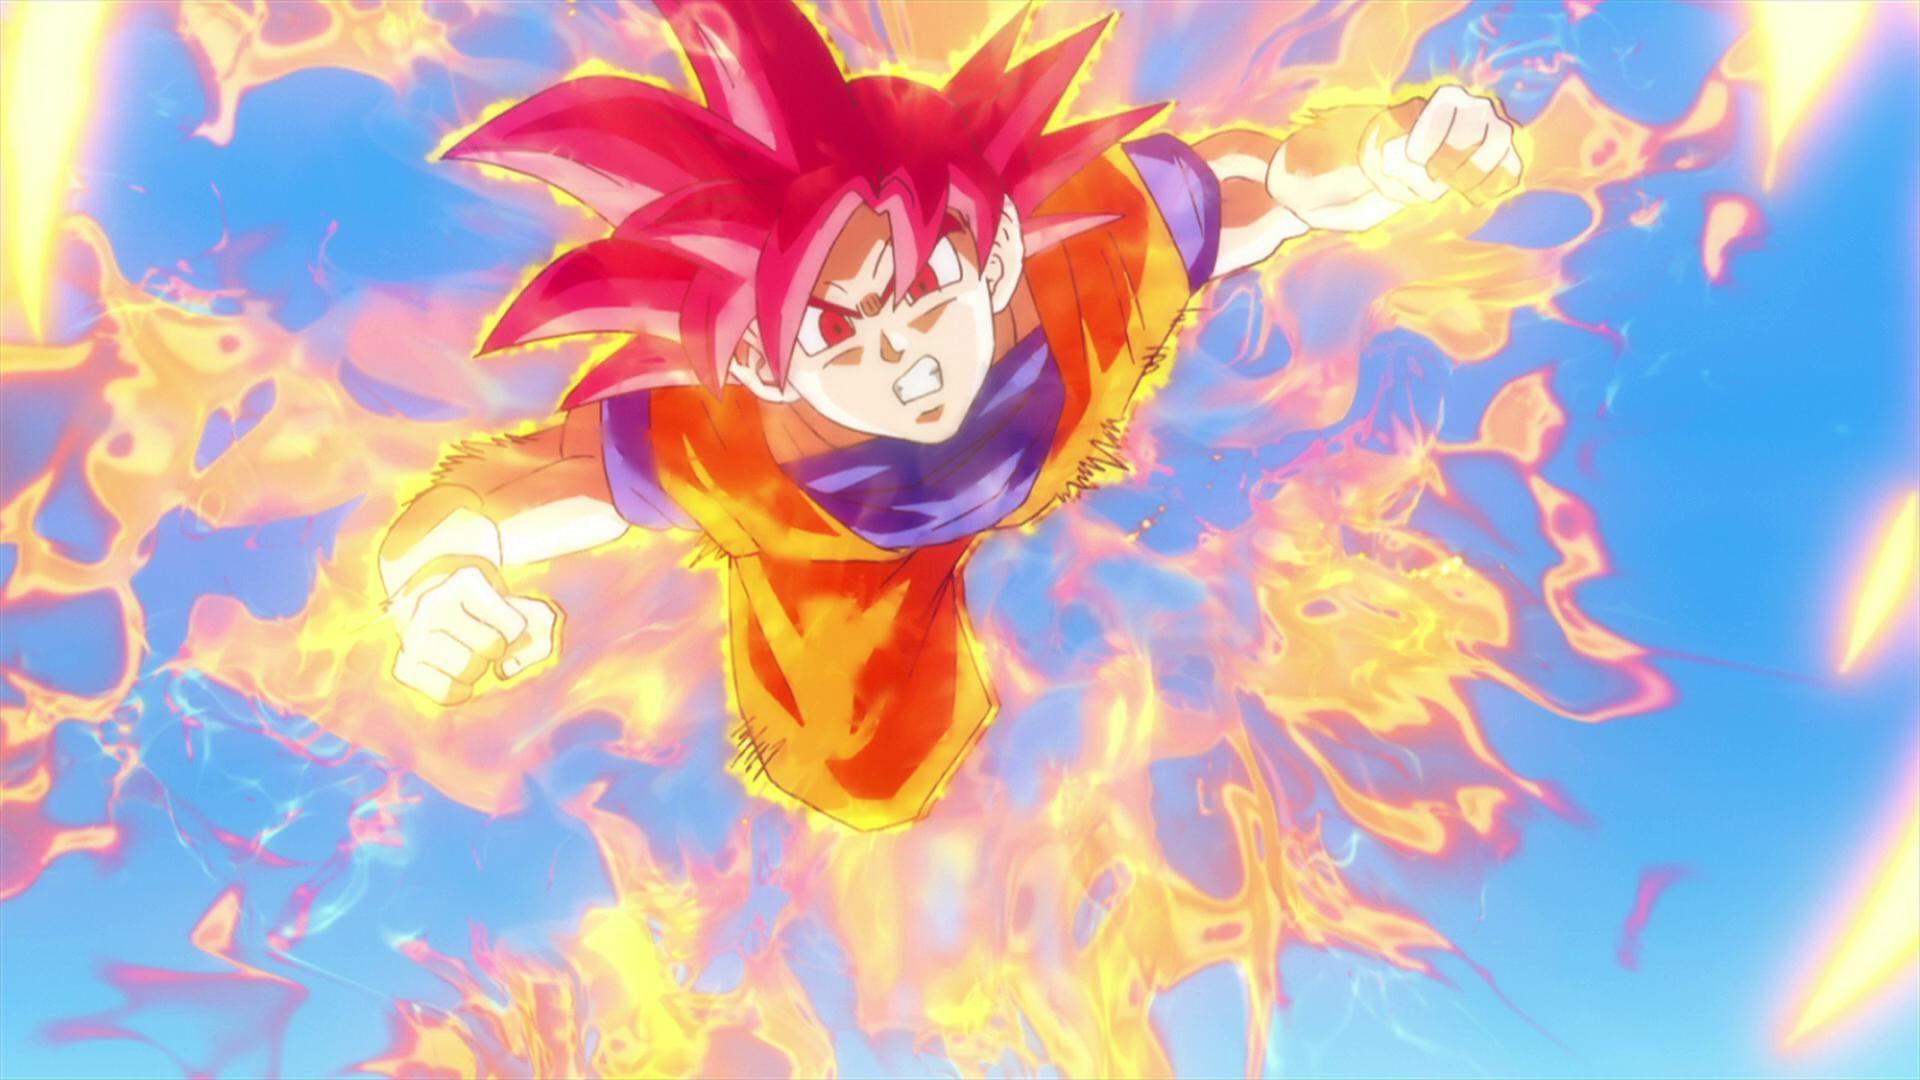 Goku Super Saiyan God 1080p Wallpaper Dragones Dragon Ball